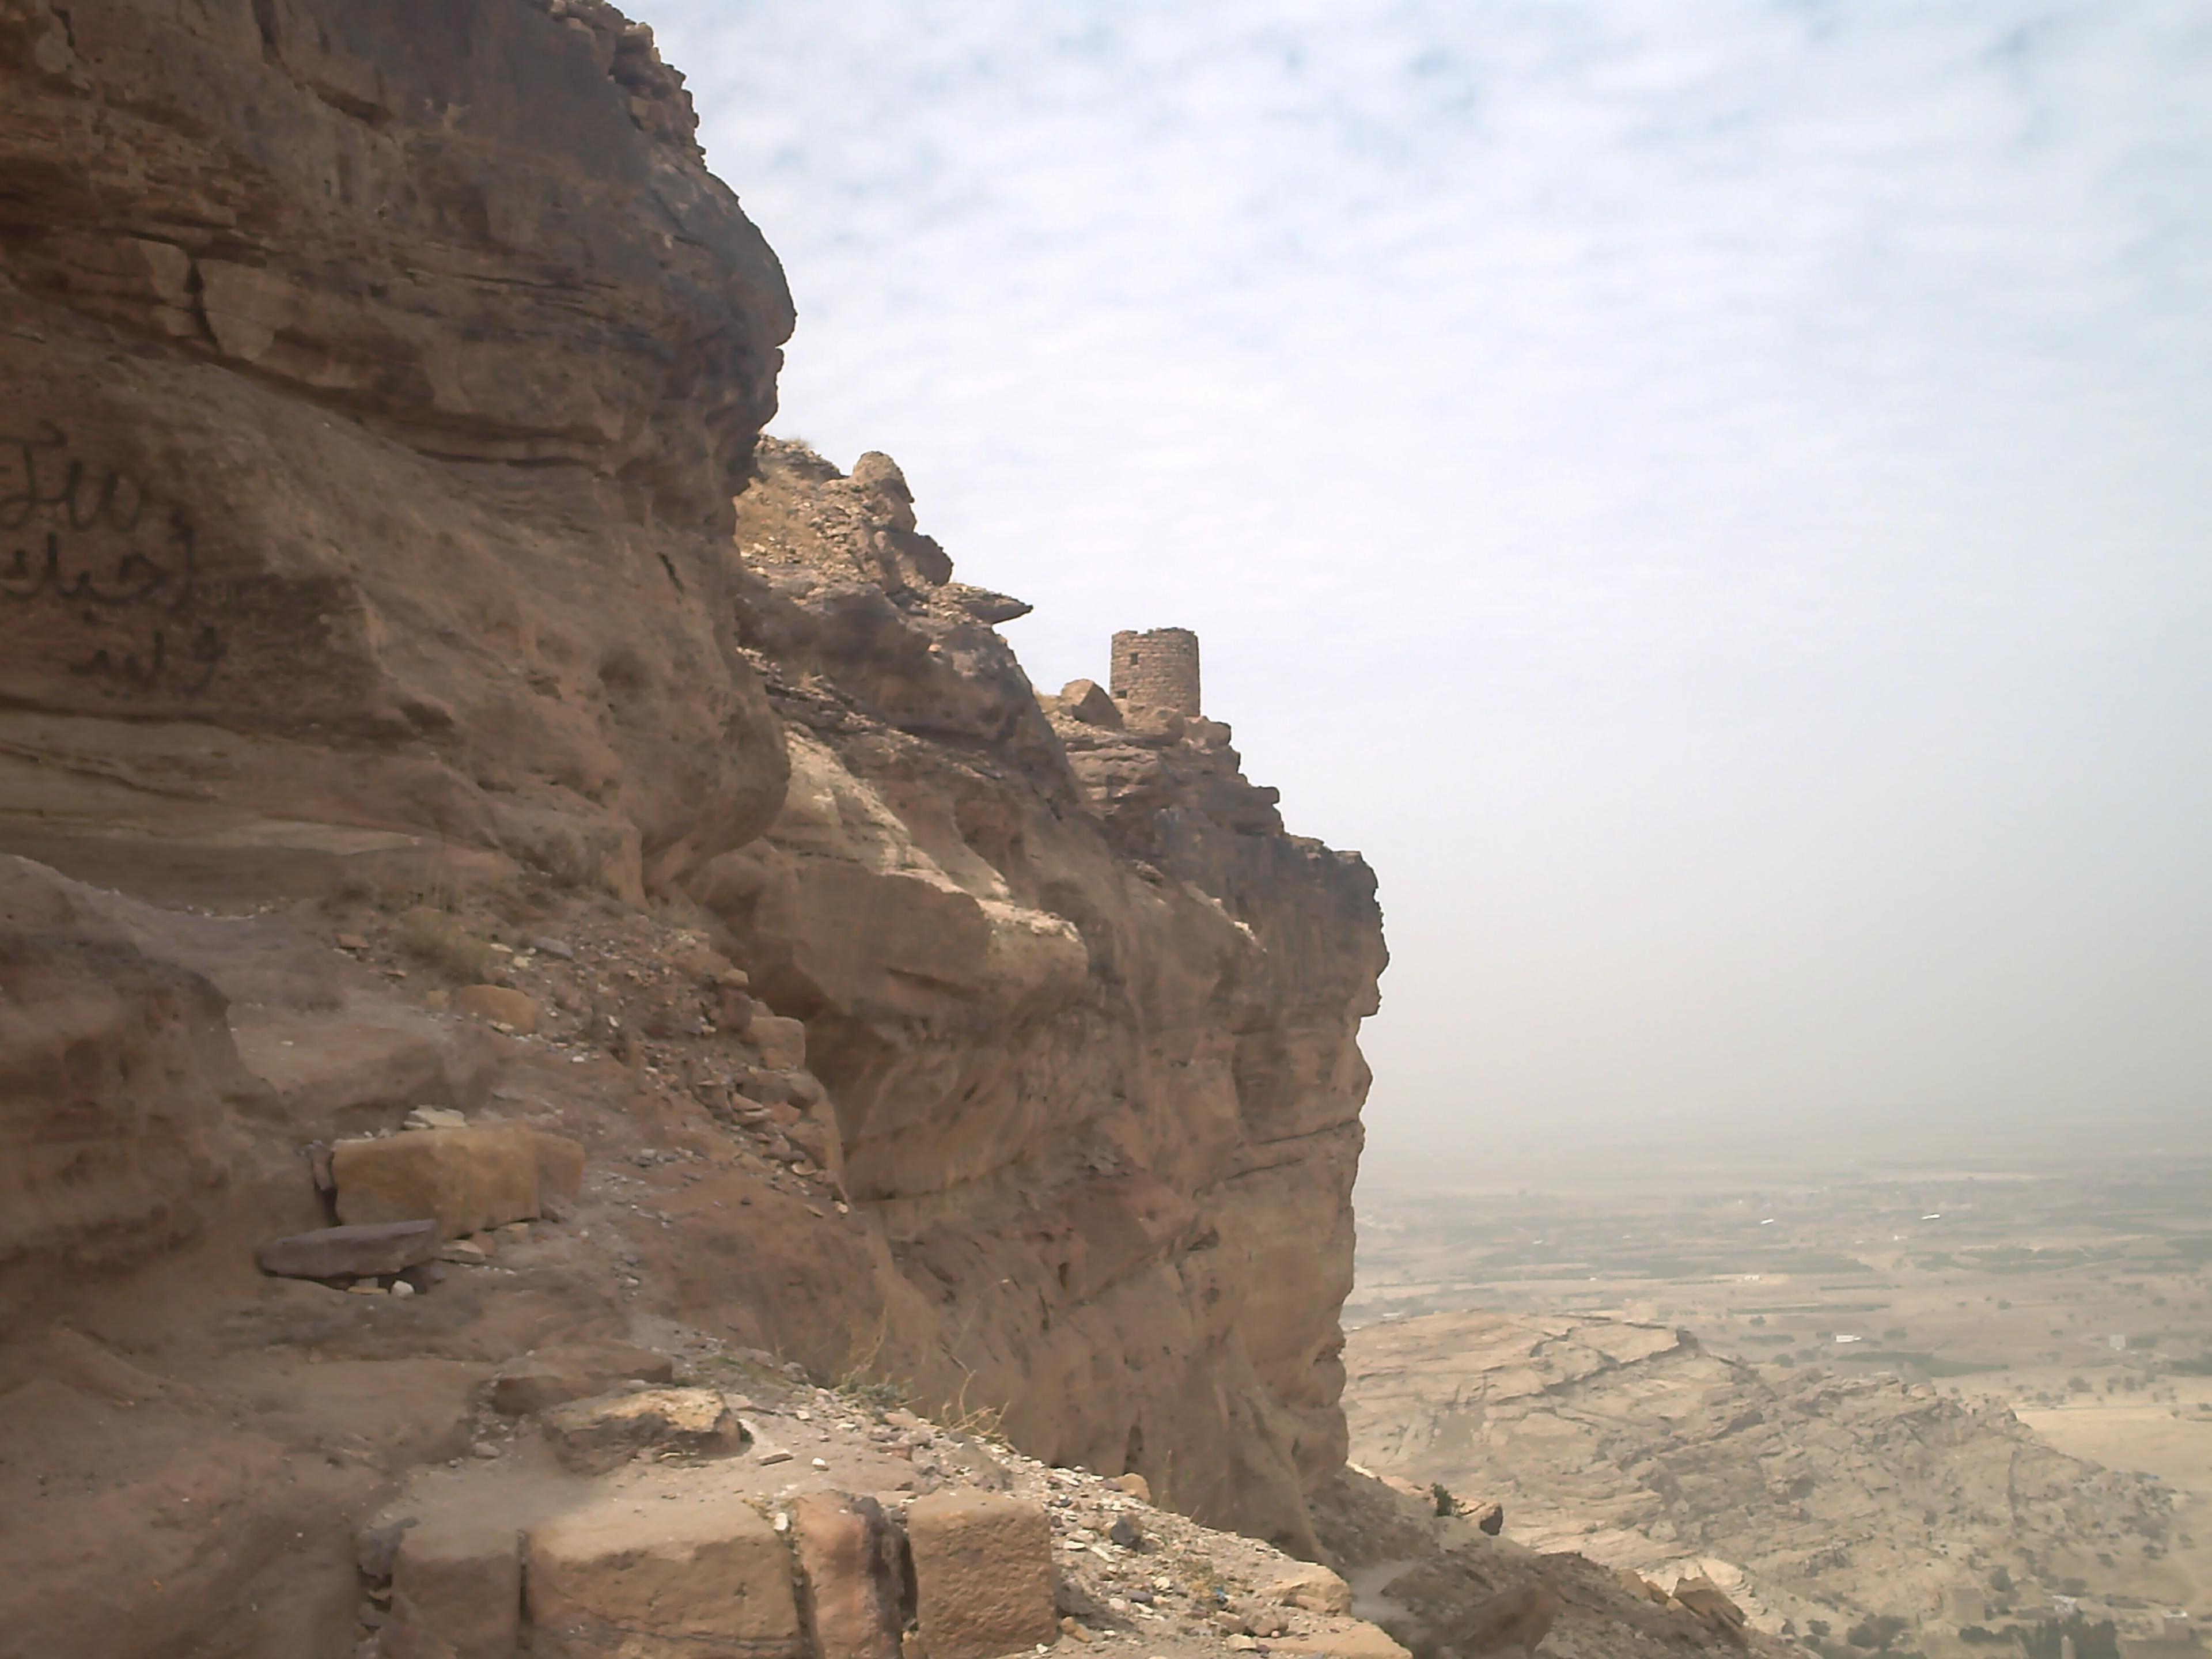 File:Zimarmar fort on hill top.JPG - Wikimedia Commons